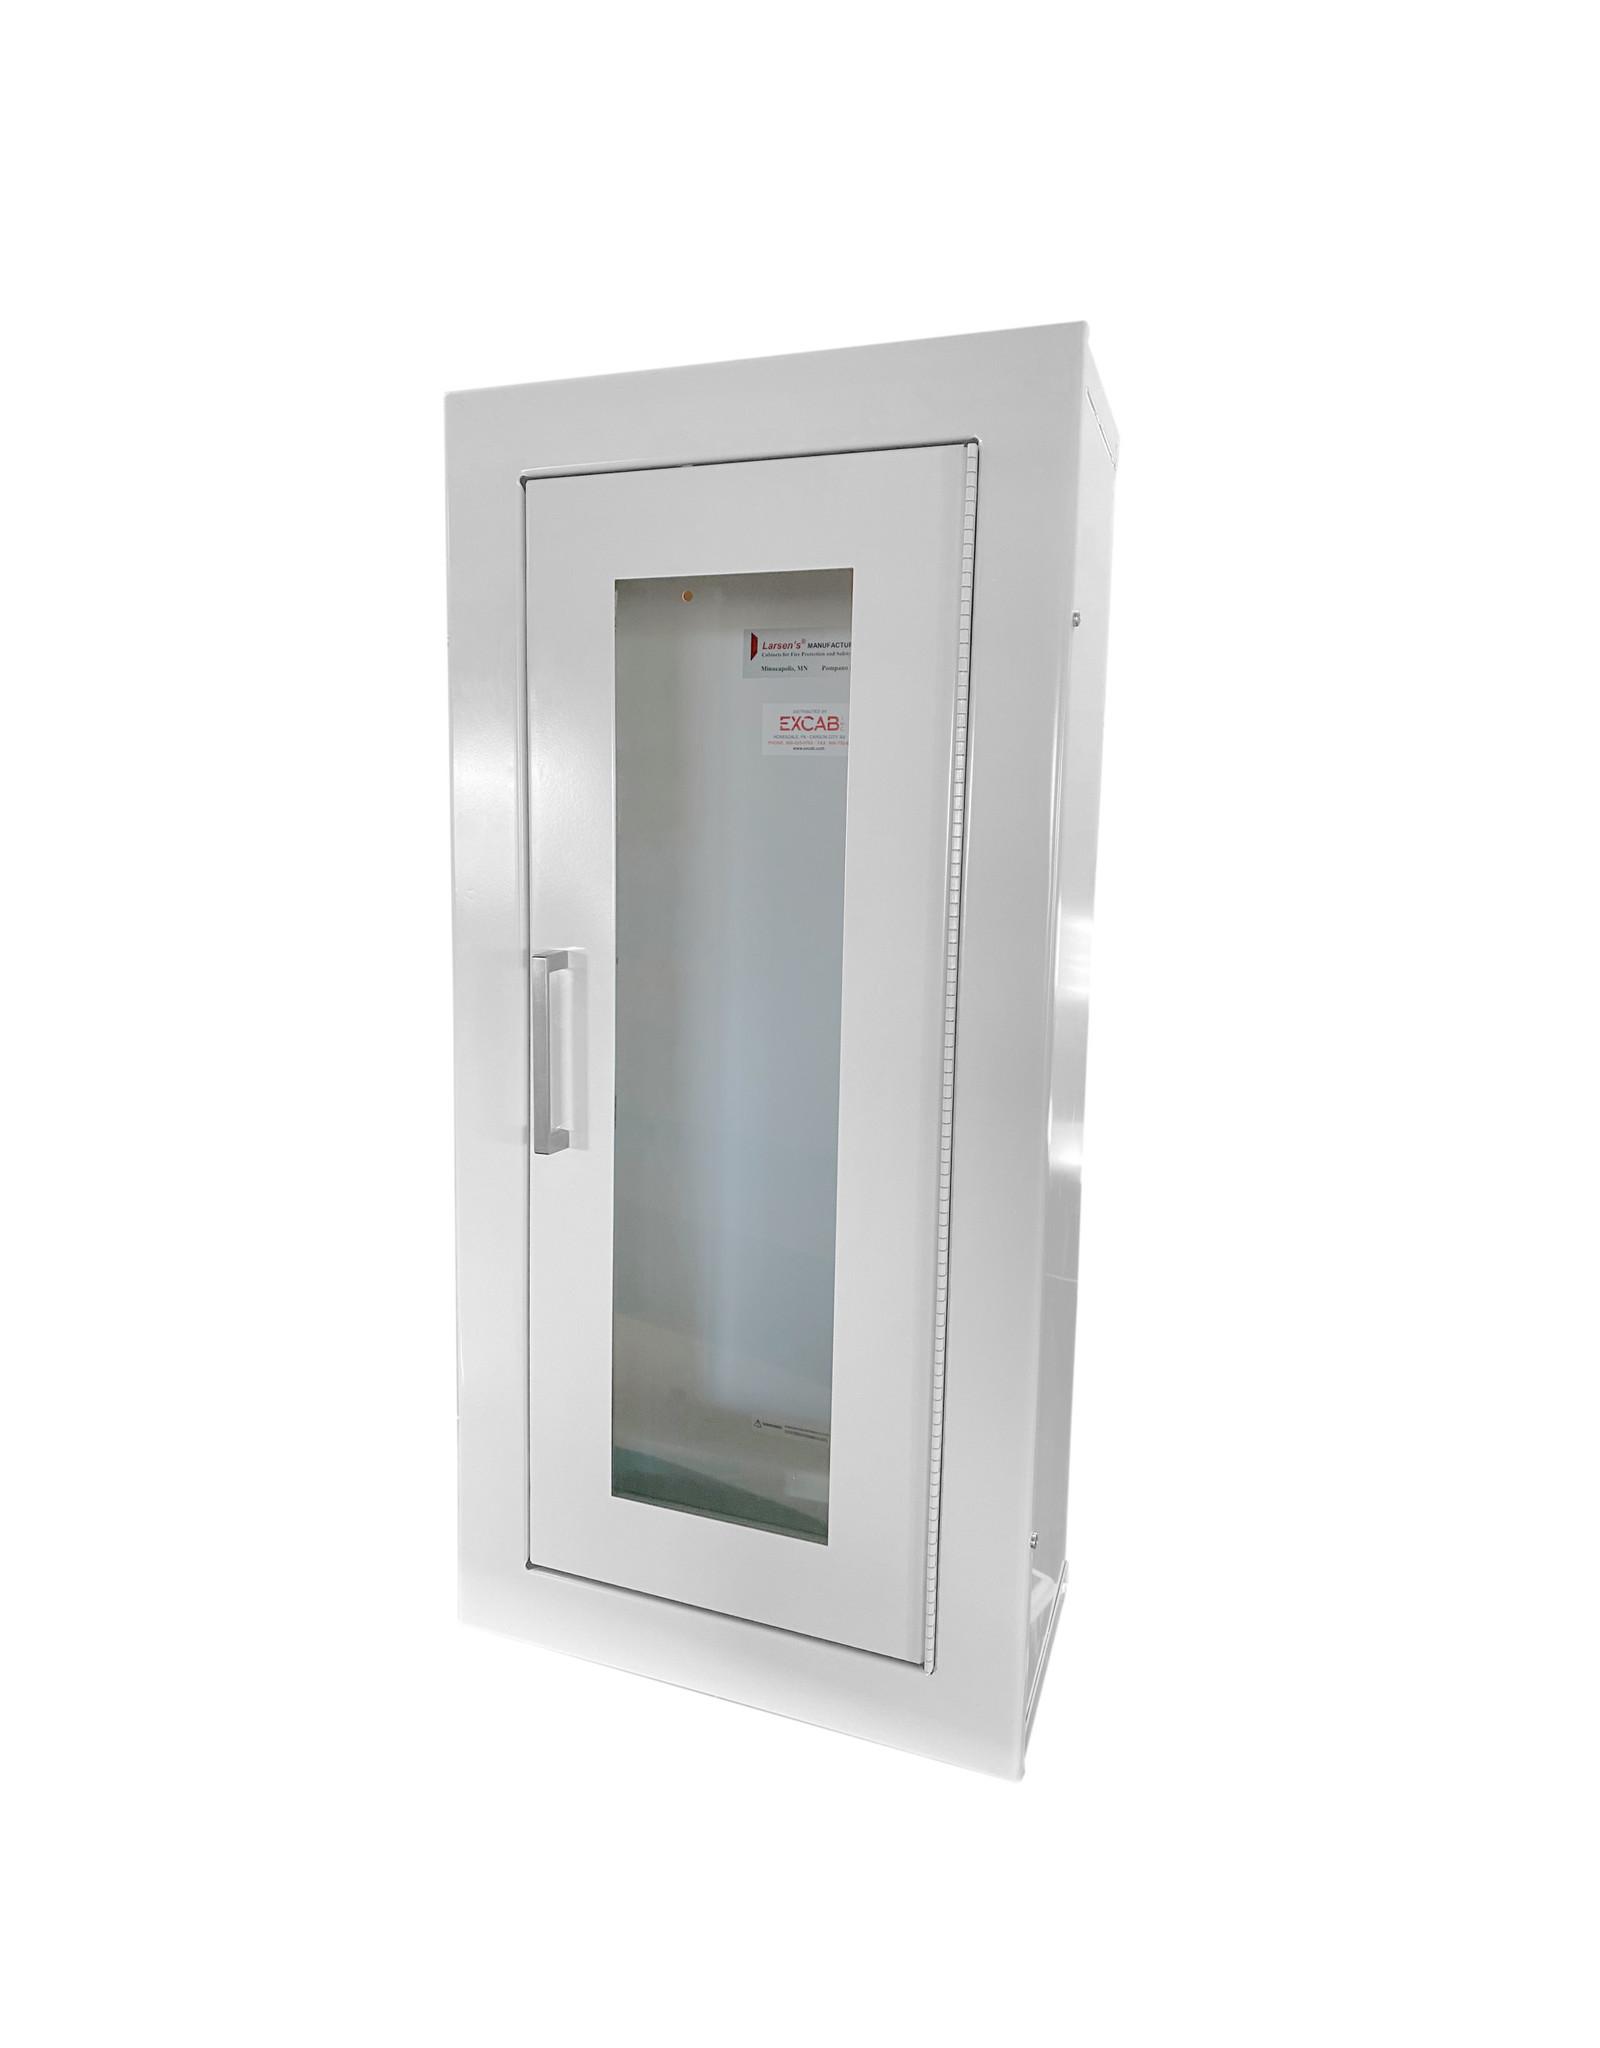 Larsen's Mfg 24 x 9.5 Inch Cabinet 10 Lbs ABC Fire Extinguisher - Steel Door and Frame, Surface Mount